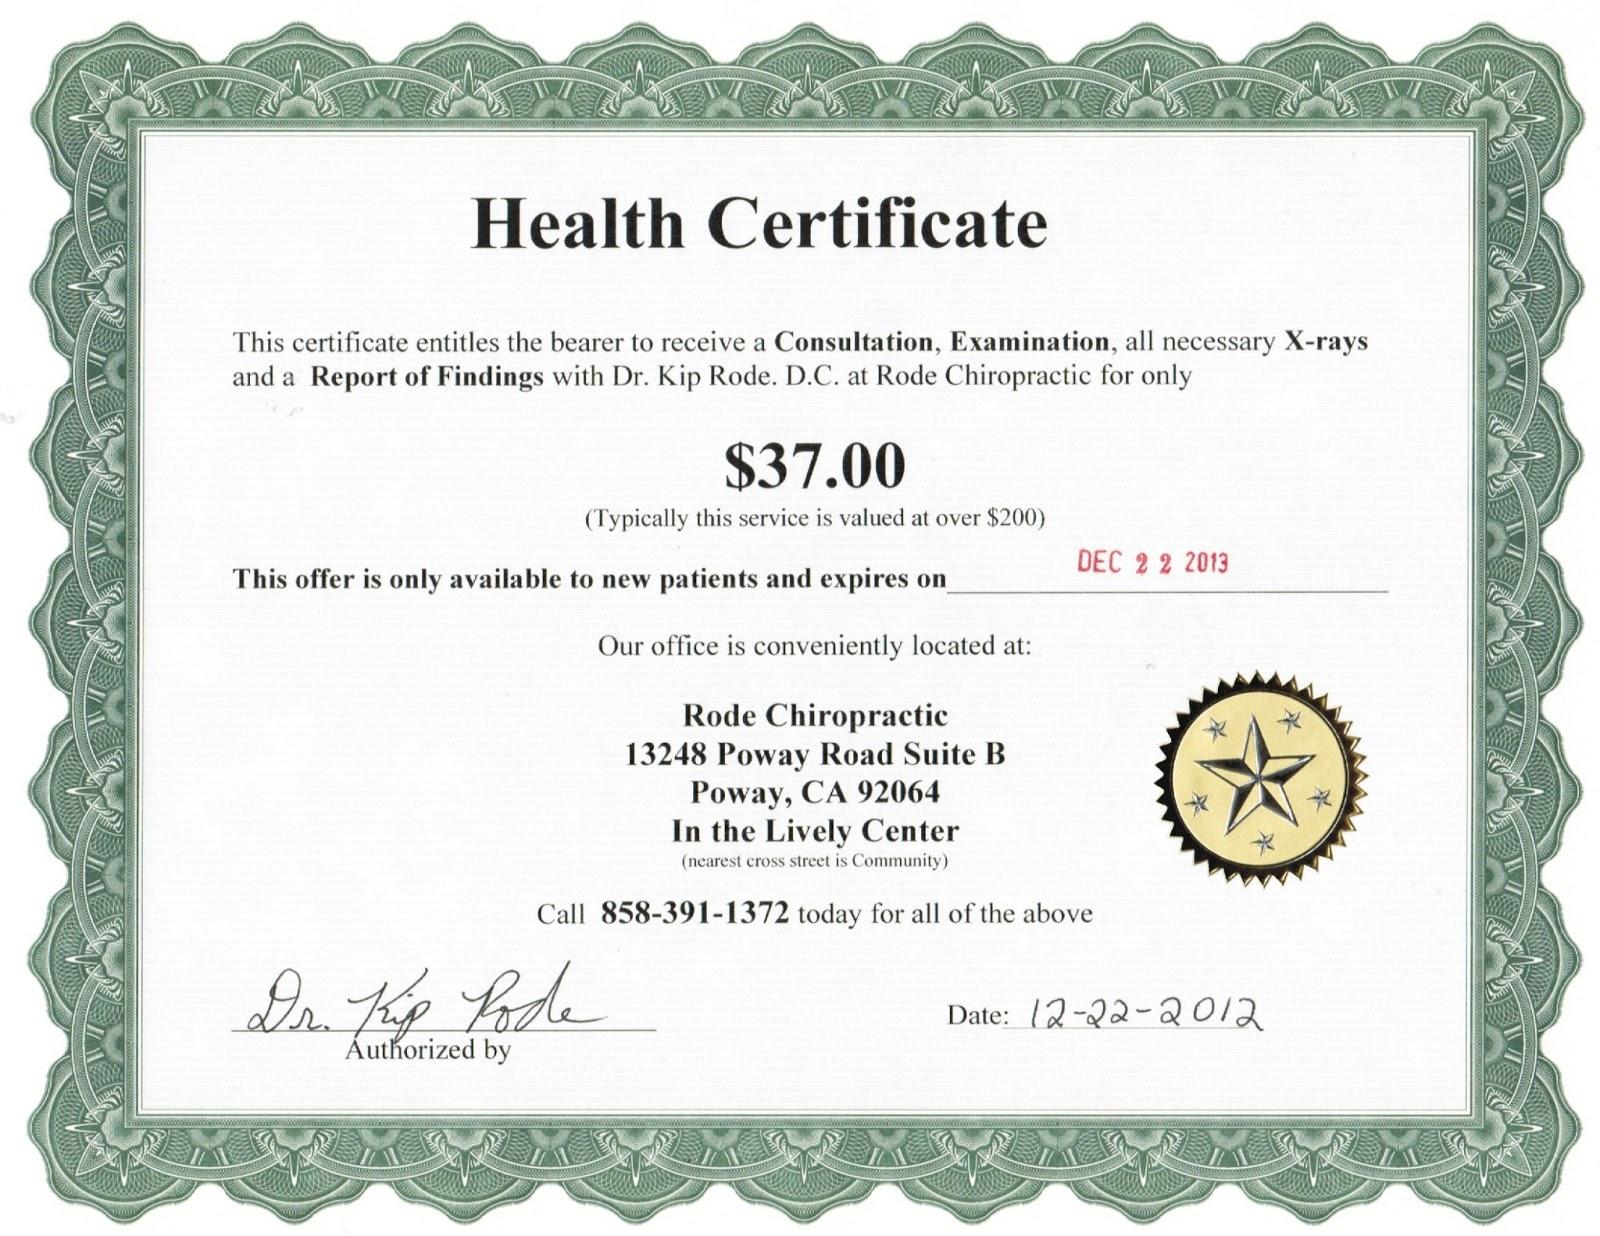 health certificate chiropractic healthy visa wellness start right applications documents required rode patient chiropractor poway kip dr website rude lifestyle